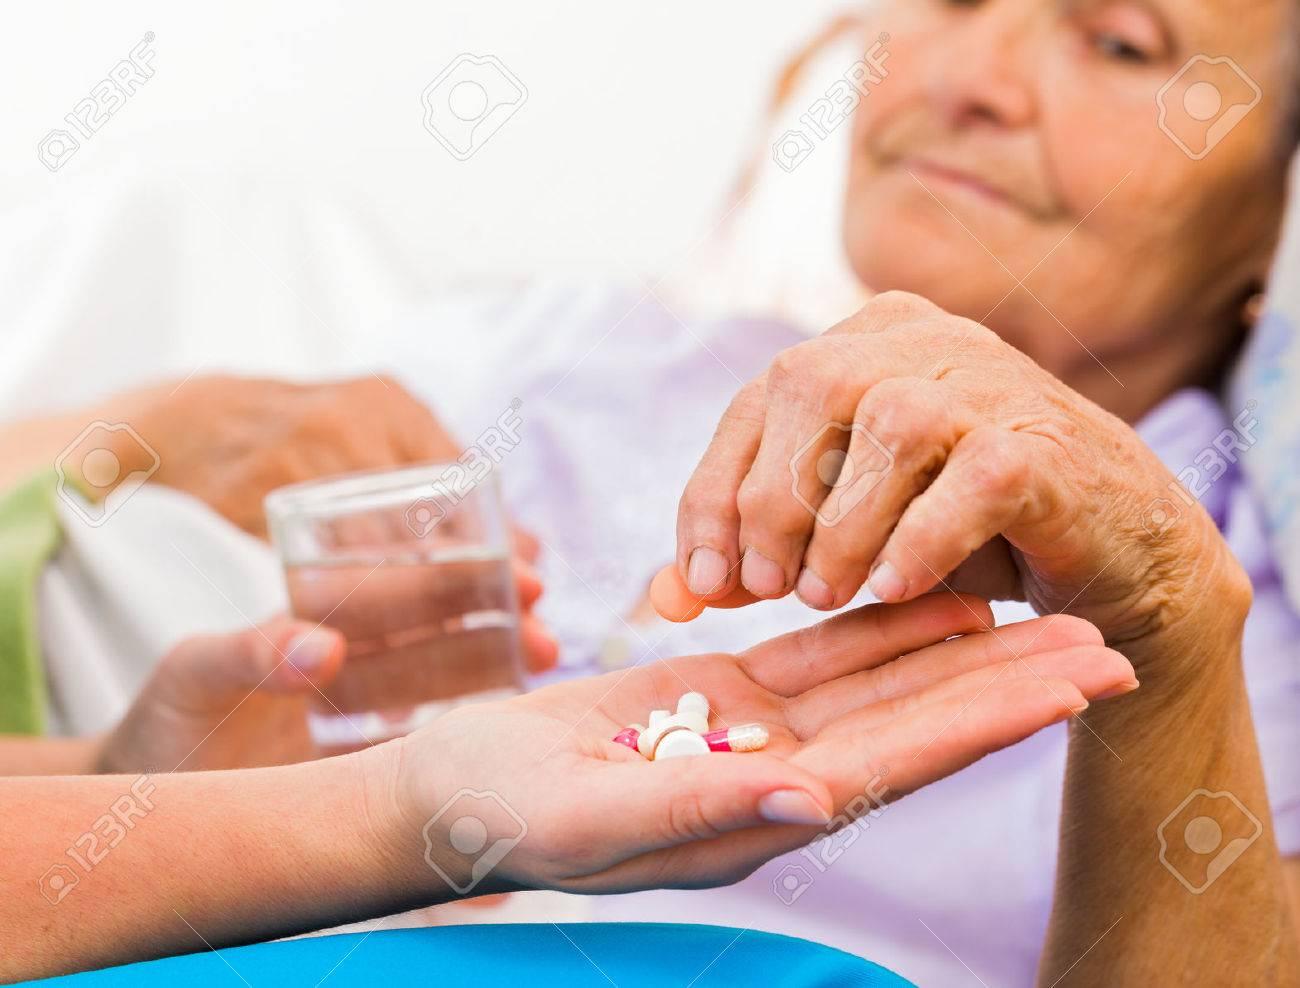 Homecare nurse helping elderly lady to take her daily medicine. Stock Photo - 55422471